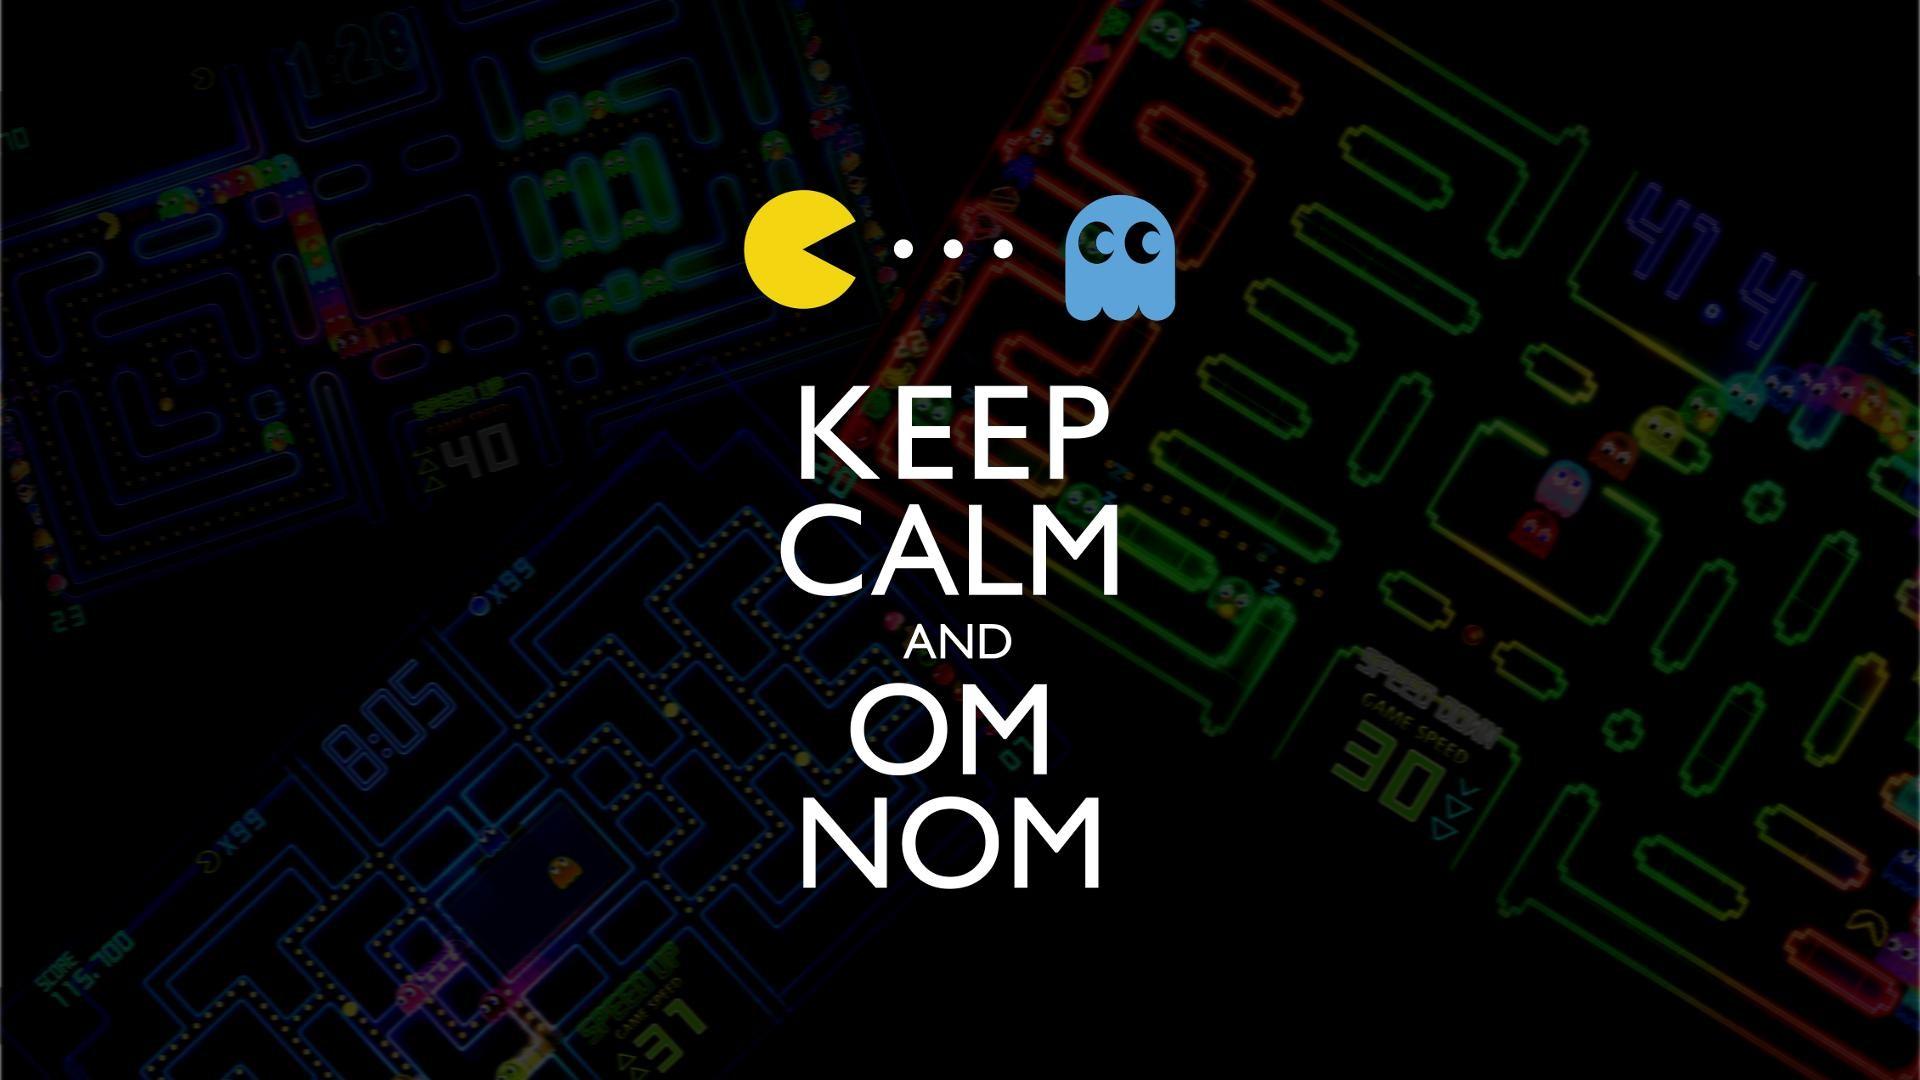 Res: 1920x1080, Pac-Man HD Wallpaper | Hintergrund |  | ID:319144 - Wallpaper Abyss